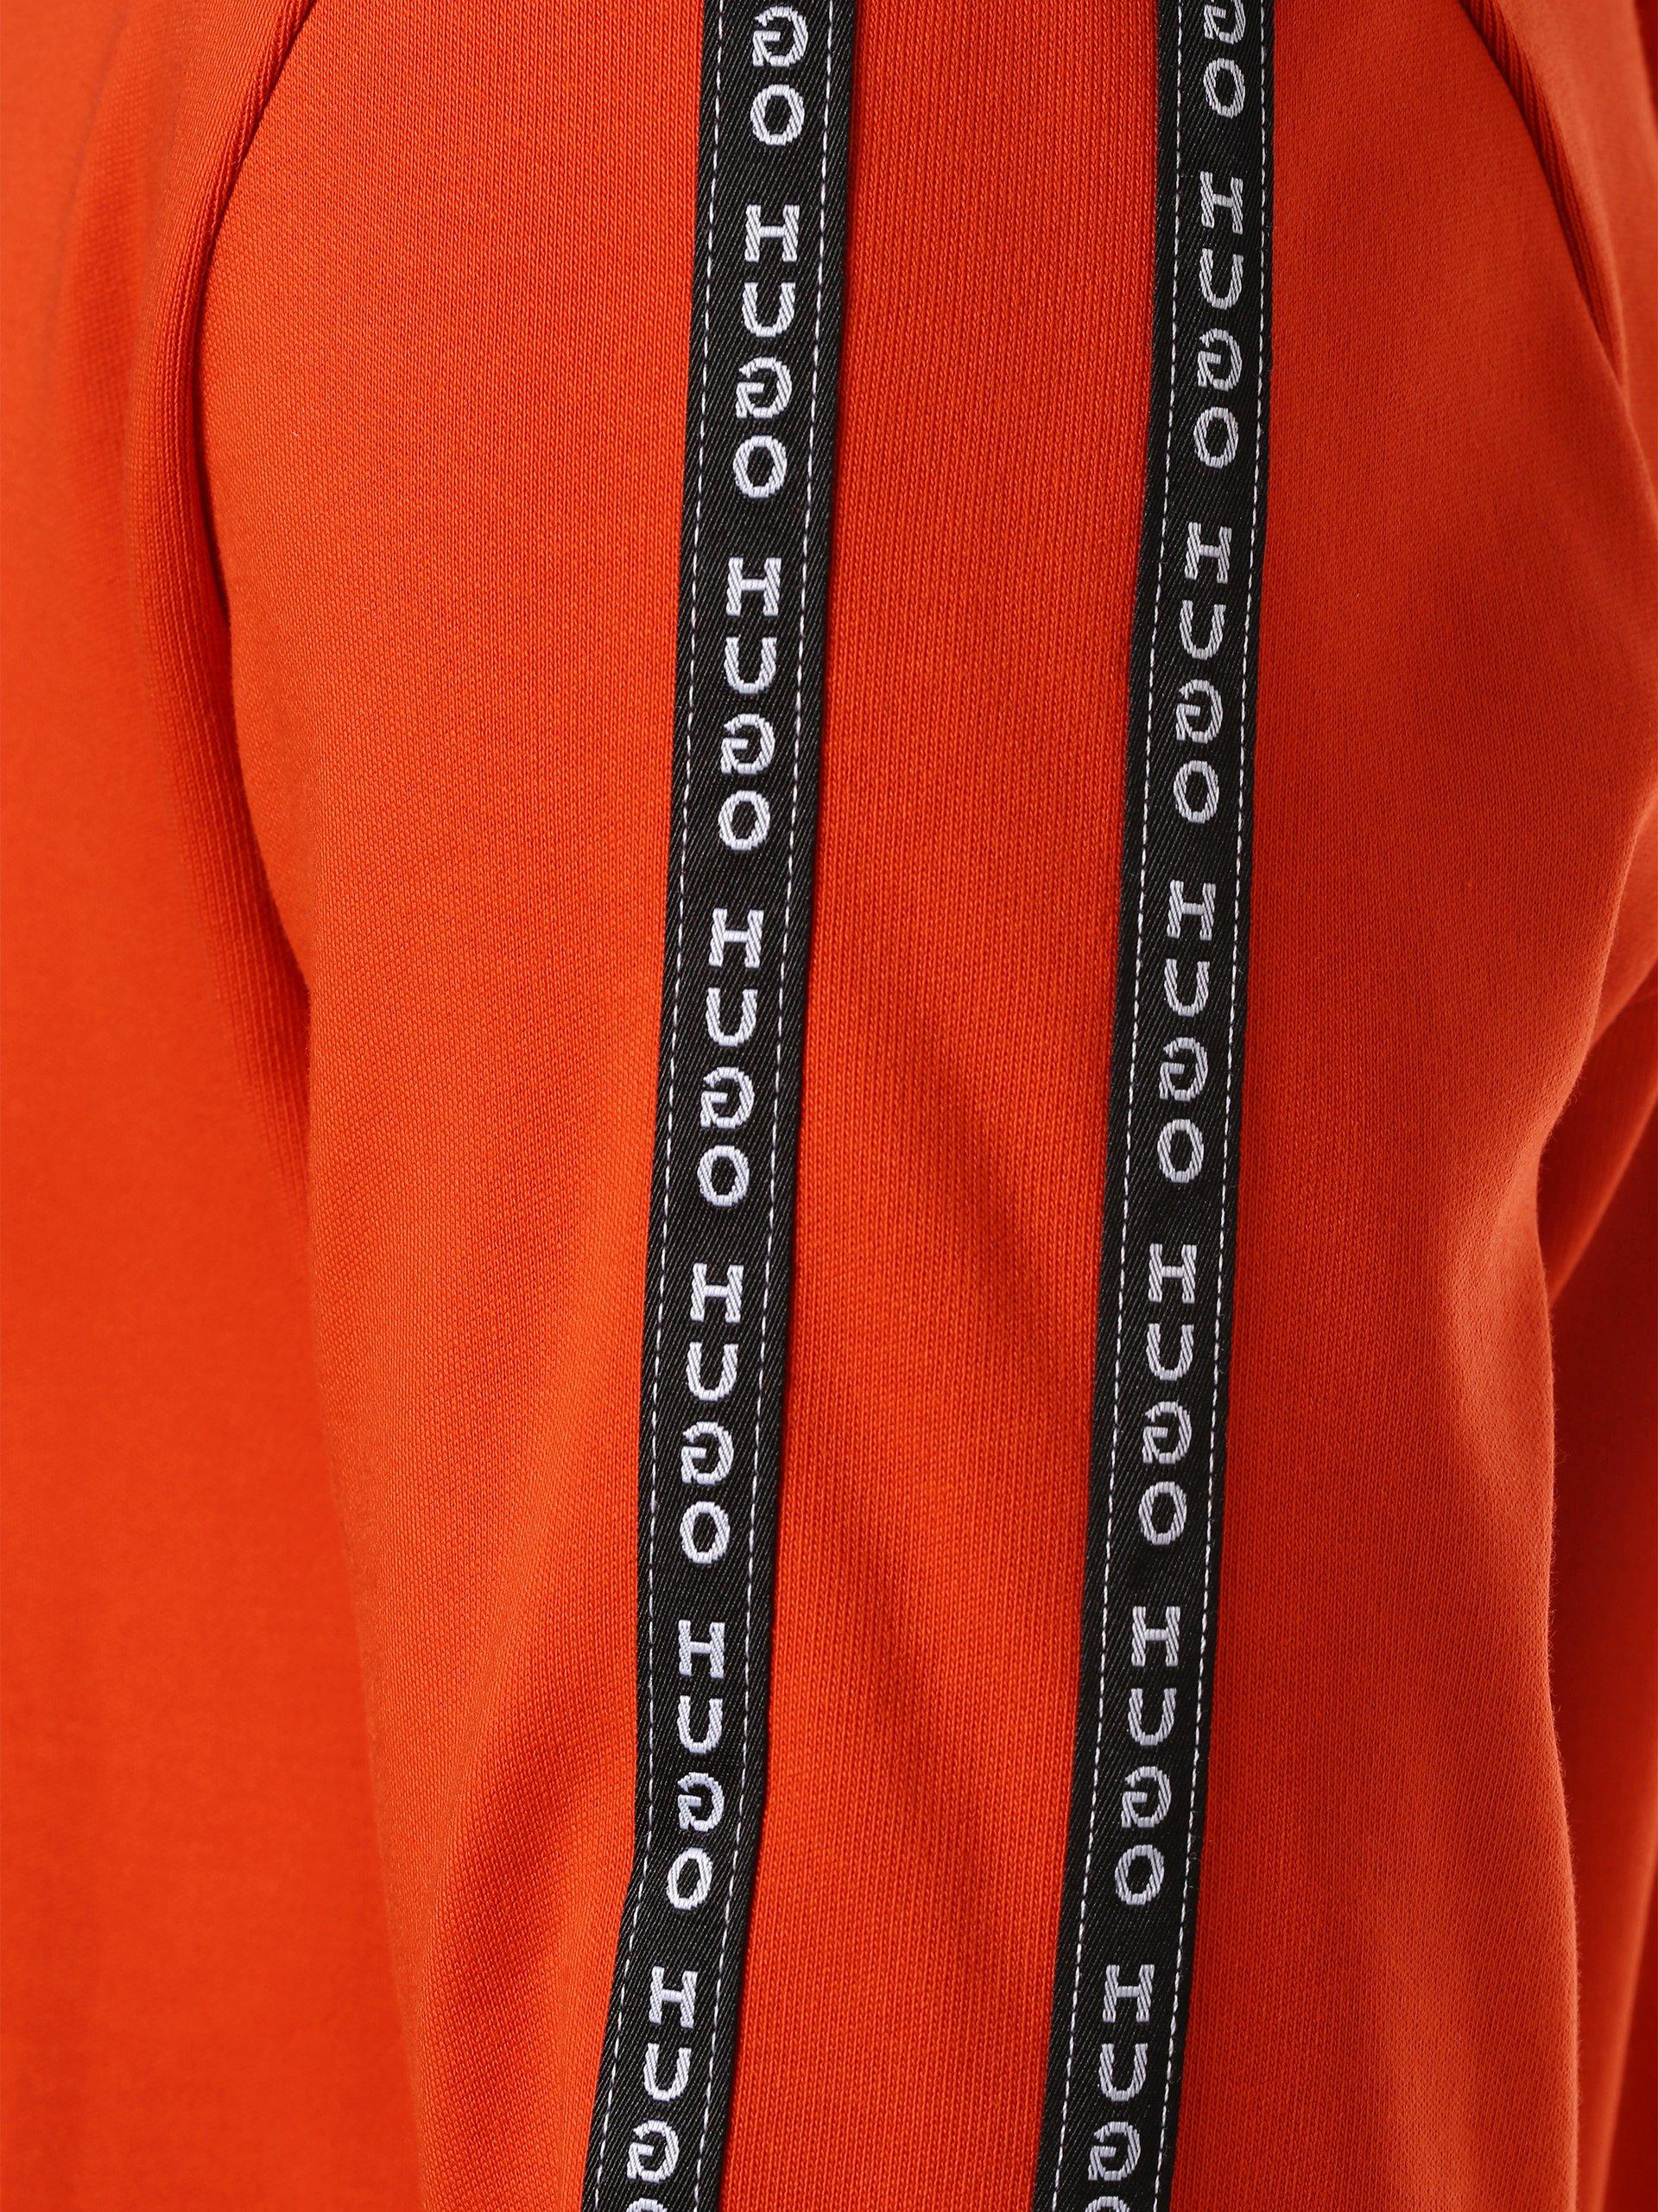 HUGO Męska bluza nierozpinana – Dercolano